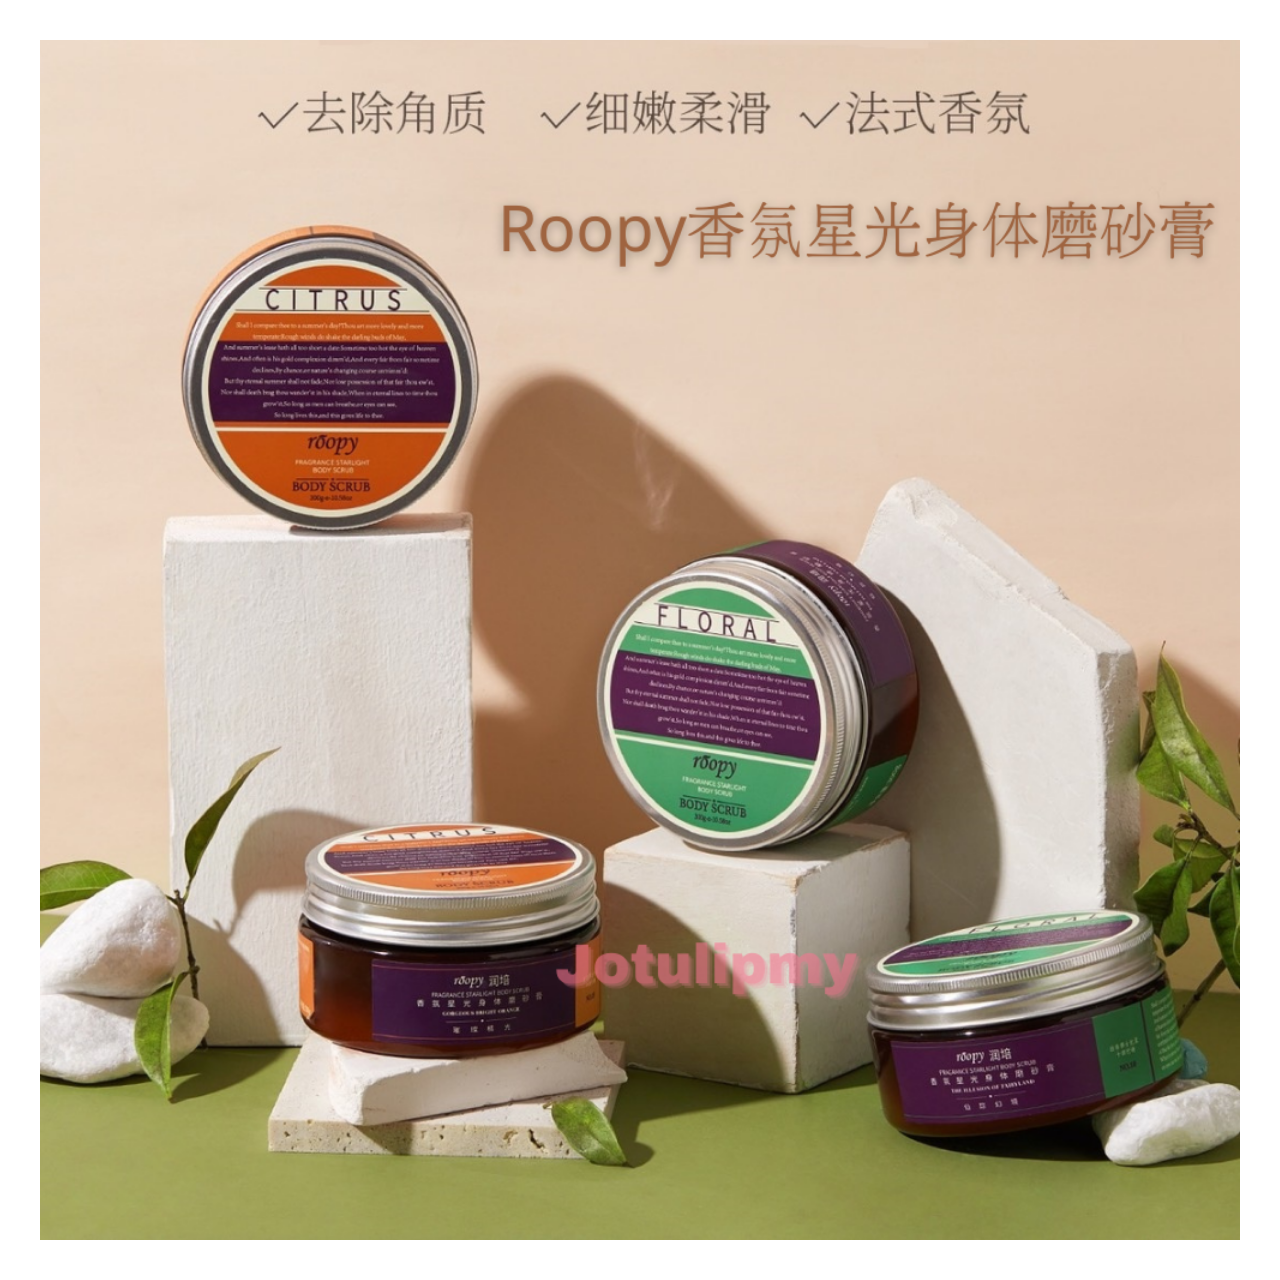 roopy Fragrance Starlight Body Scrub 香氛星光身体磨砂膏300g 补水嫩肤全身清洁按摩膏